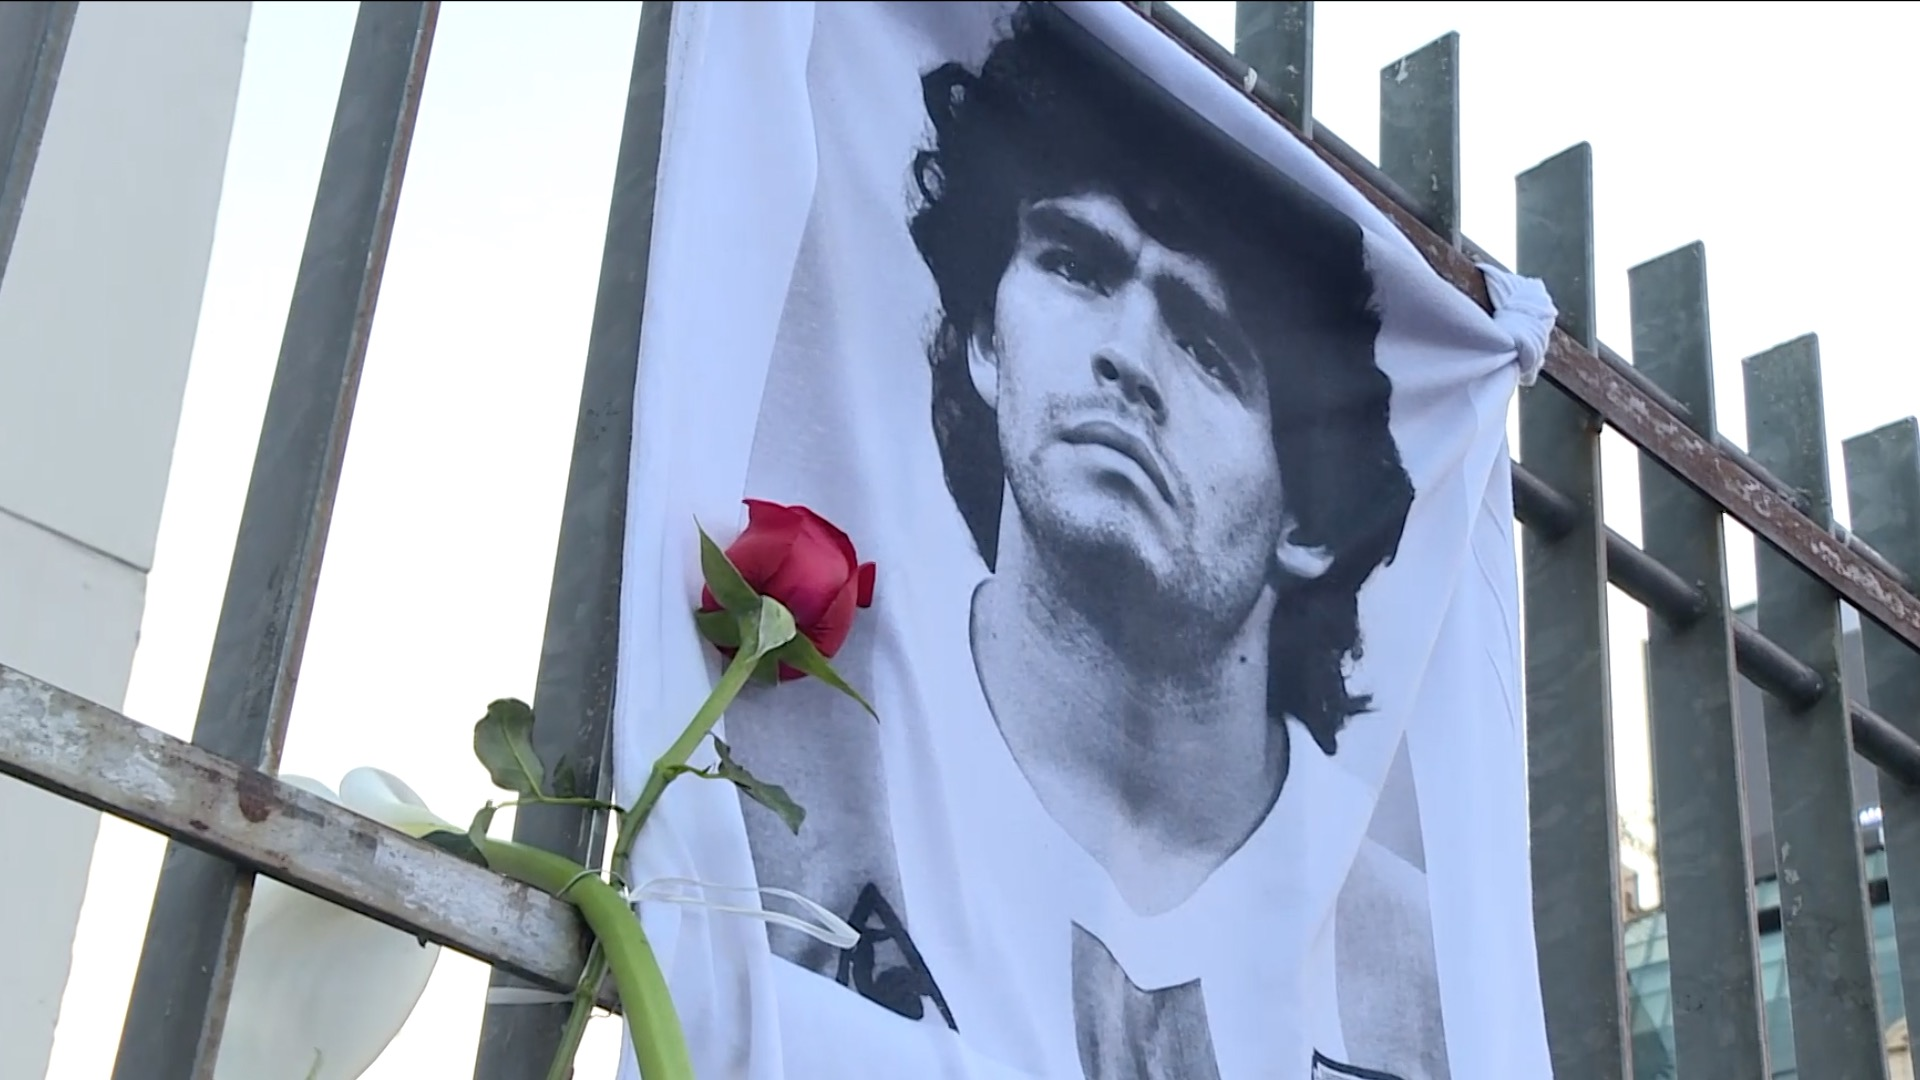 People around world mourn death of football legend Maradona